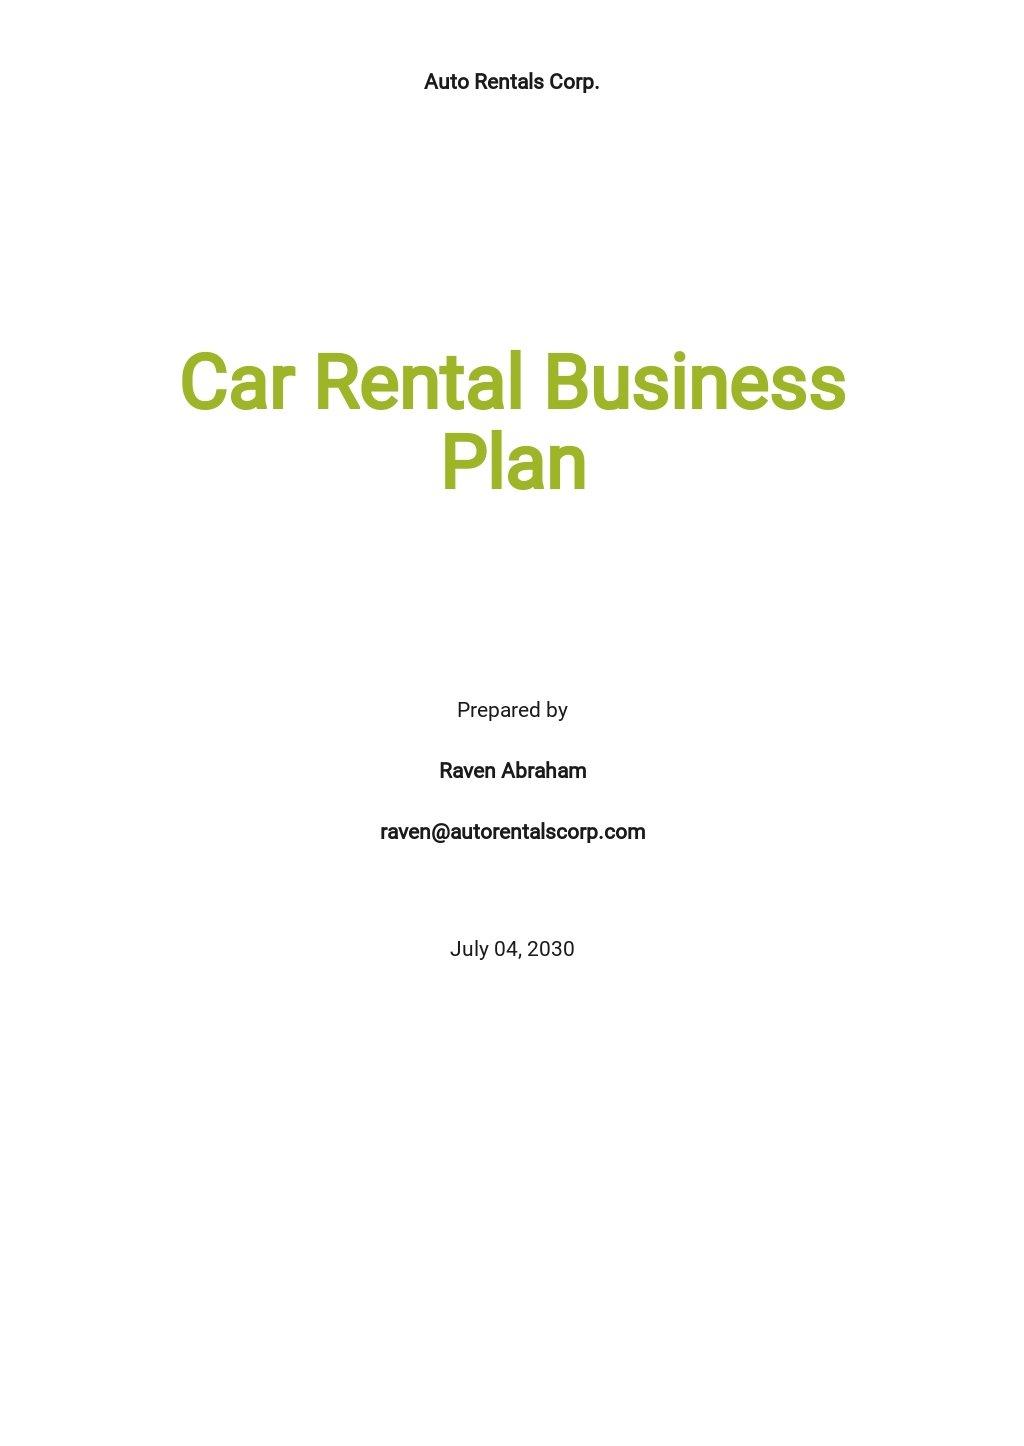 Car Rental Business Plan Template